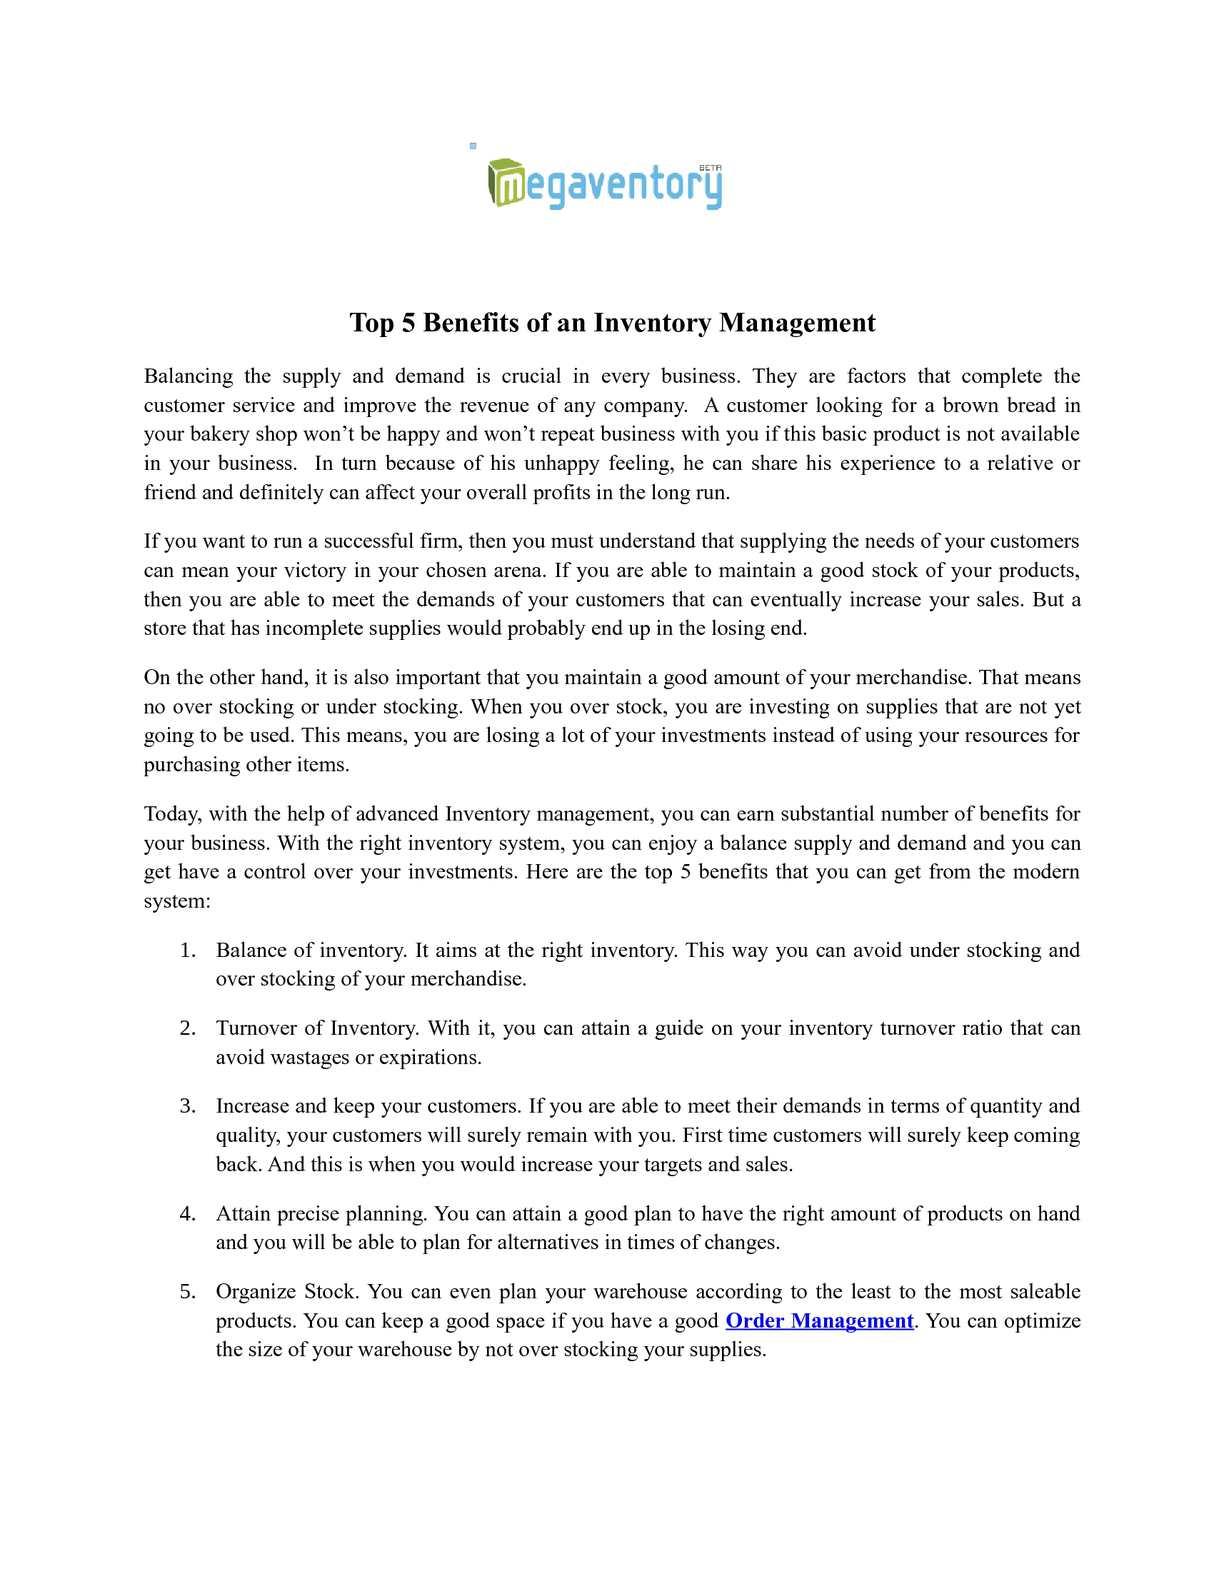 Calaméo - Top 5 Benefits of an Inventory Management